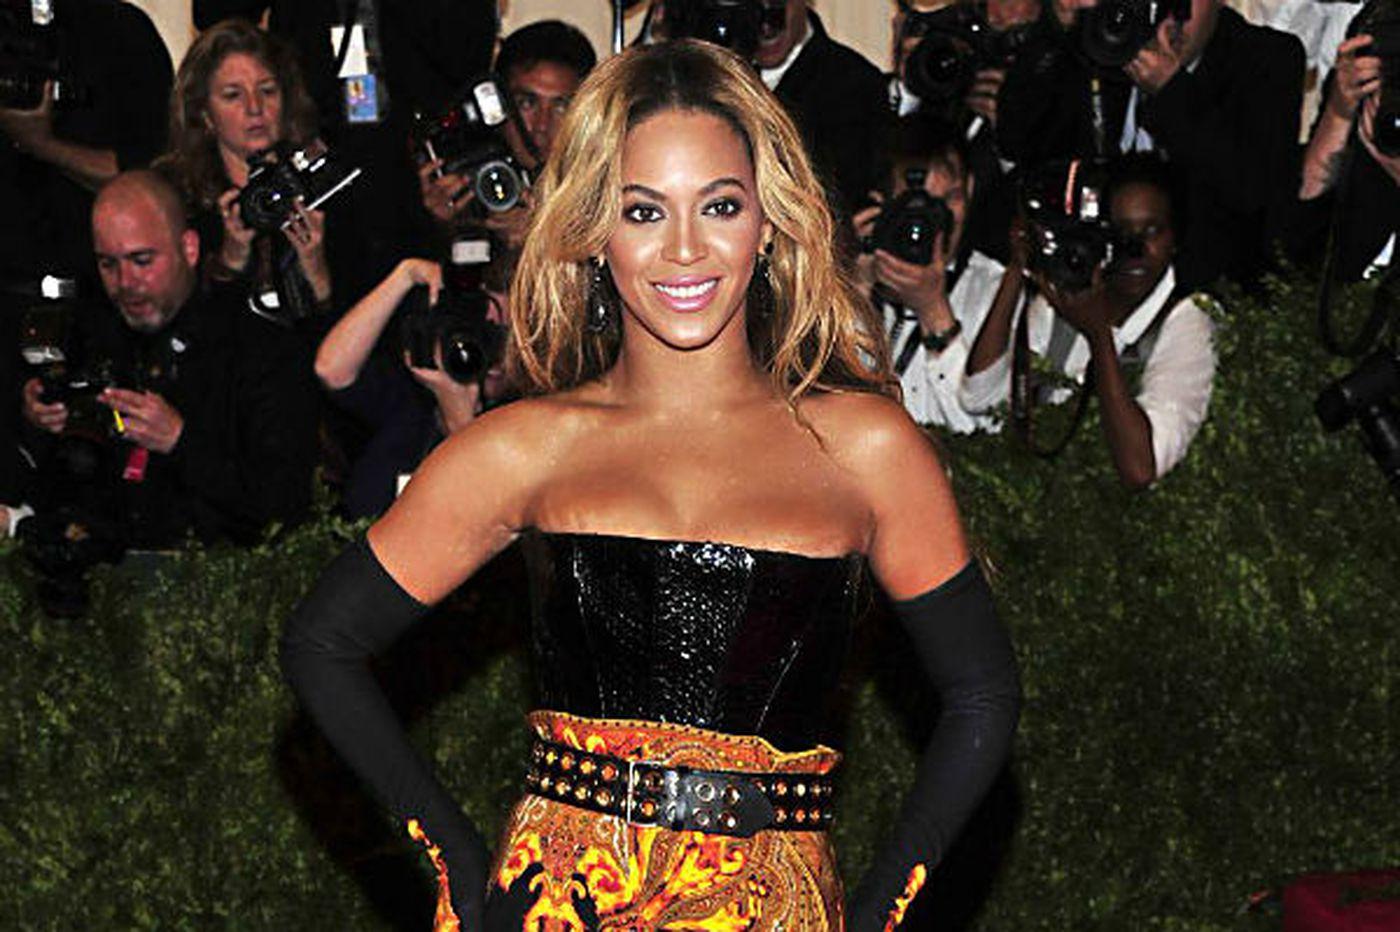 Sideshow: Beyoncé amazes world, drops album 'BEYONCÉ' online